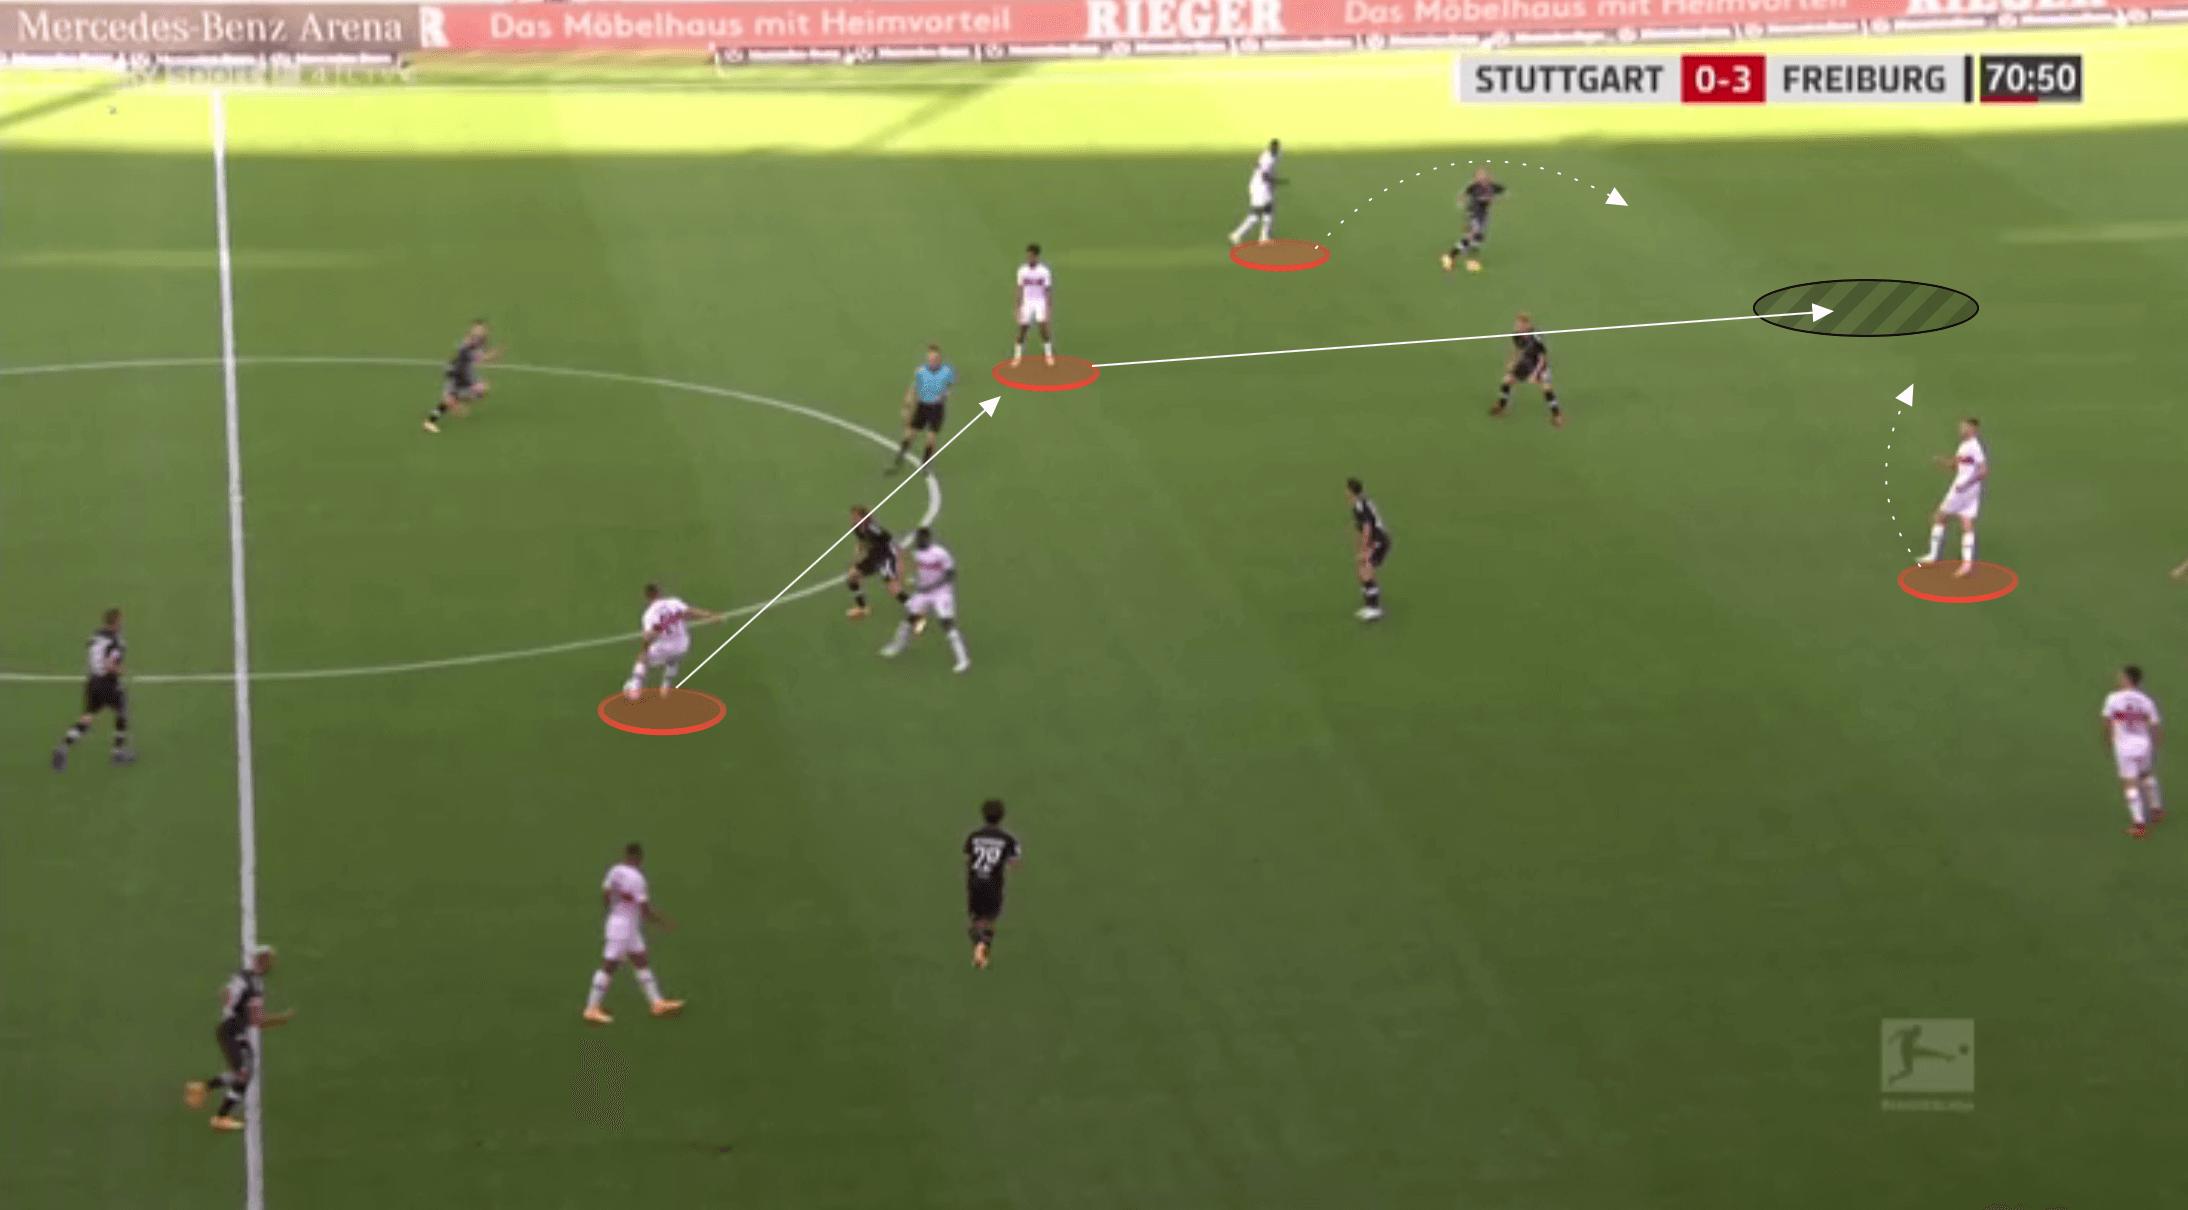 Bundesliga 2020/21: Stuttgart vs Freiburg - tactical analysis tactics